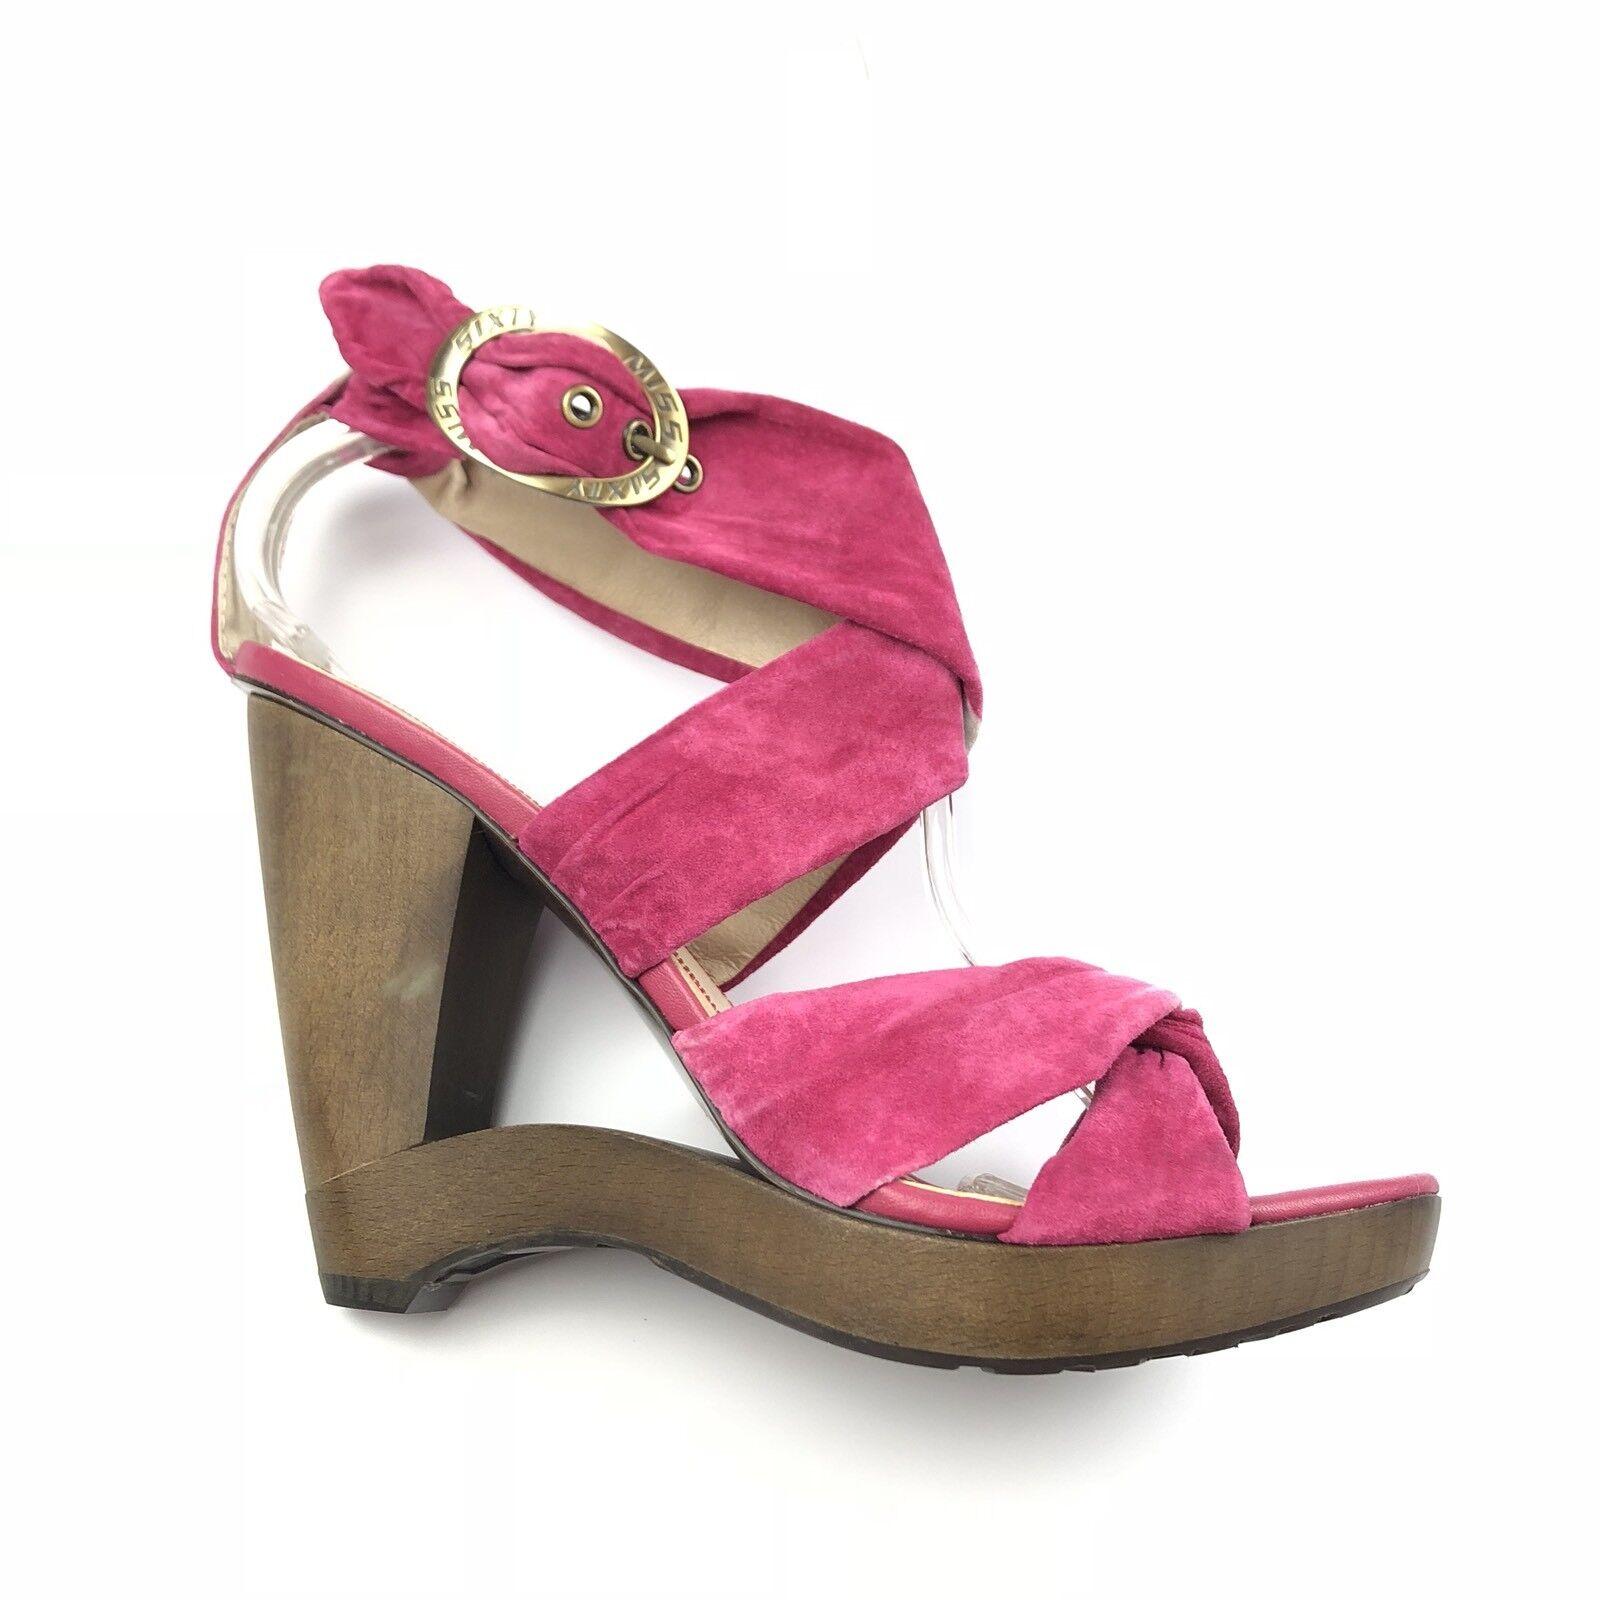 Miss Sixty Yolanda Pink Tie Dye Suede Leather Platform Wood Wedge Sandals 39.5